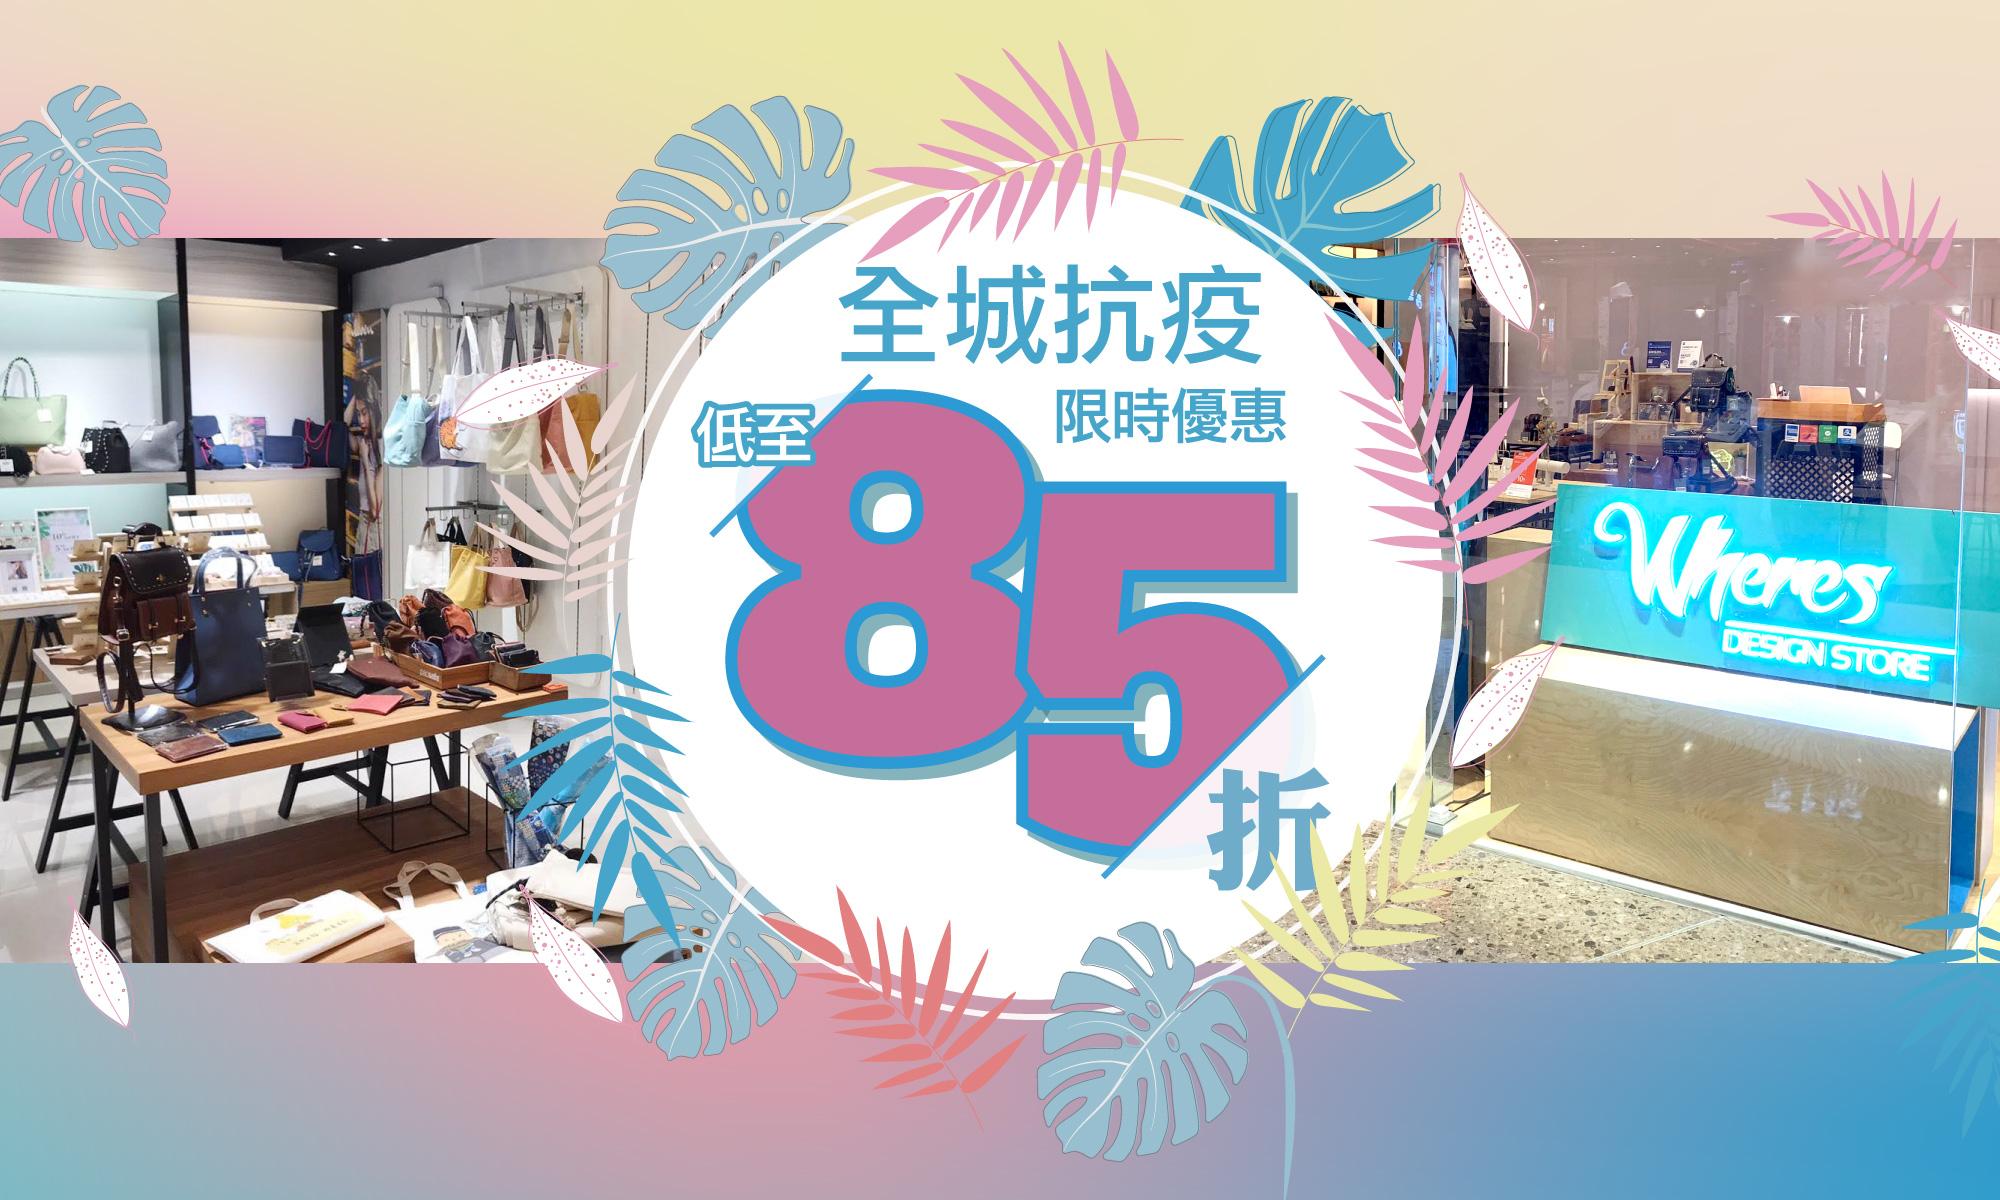 Wheres Design Store 全線 85折優惠